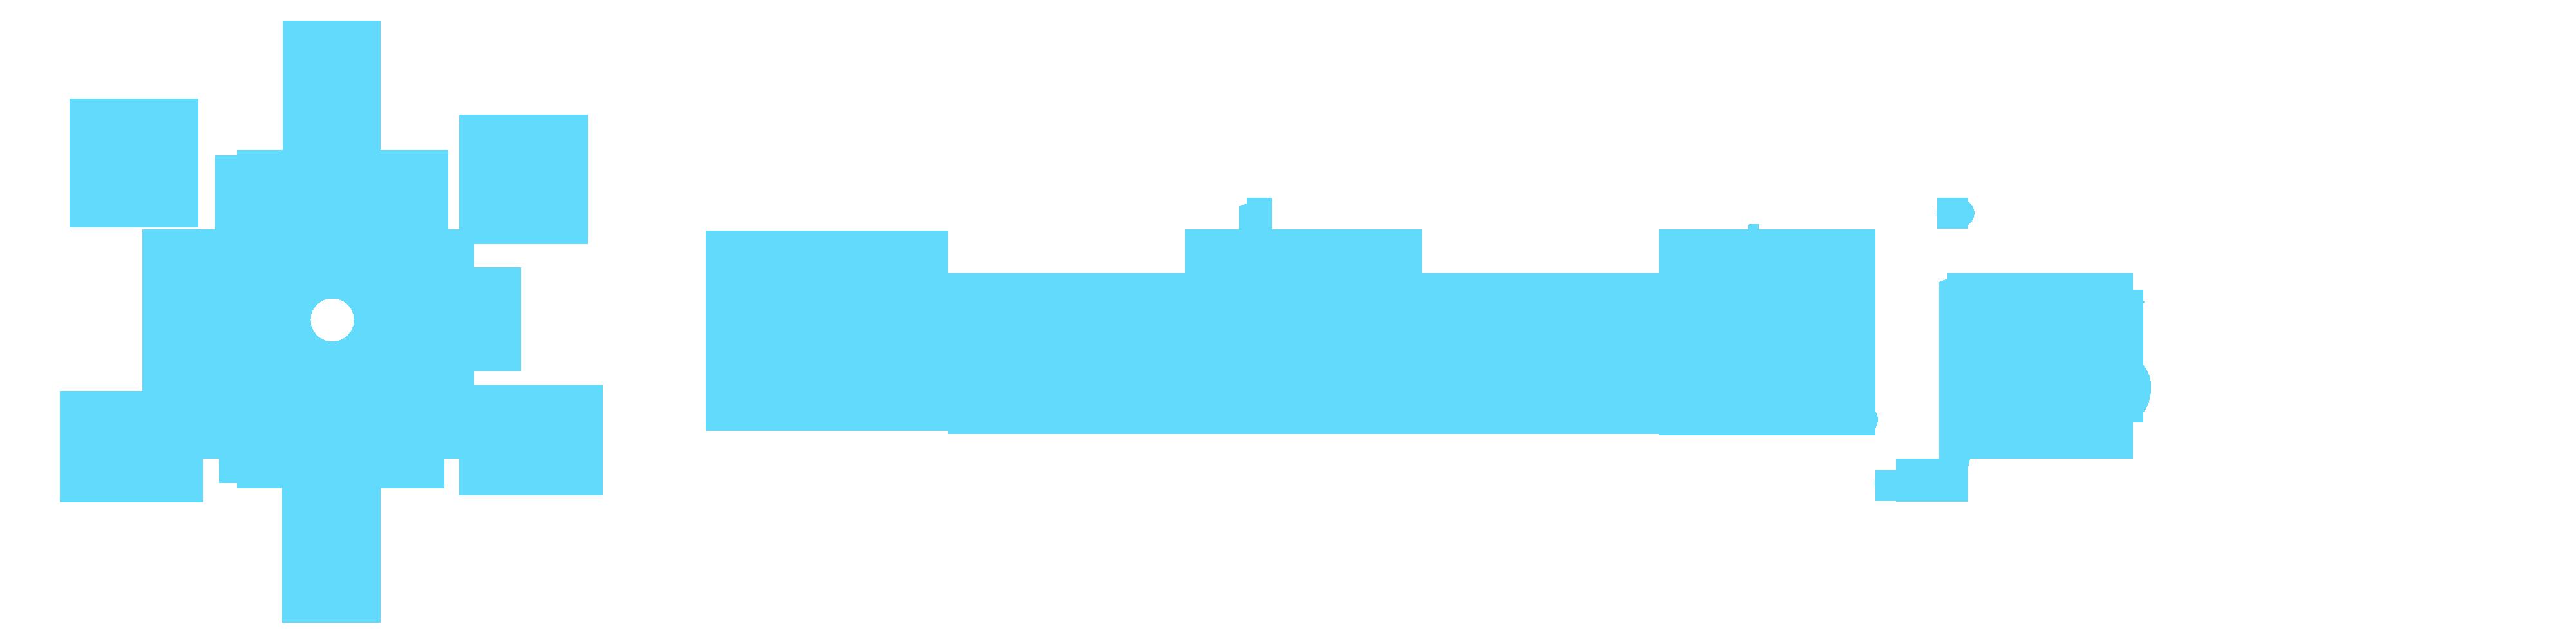 Redact.js徽标